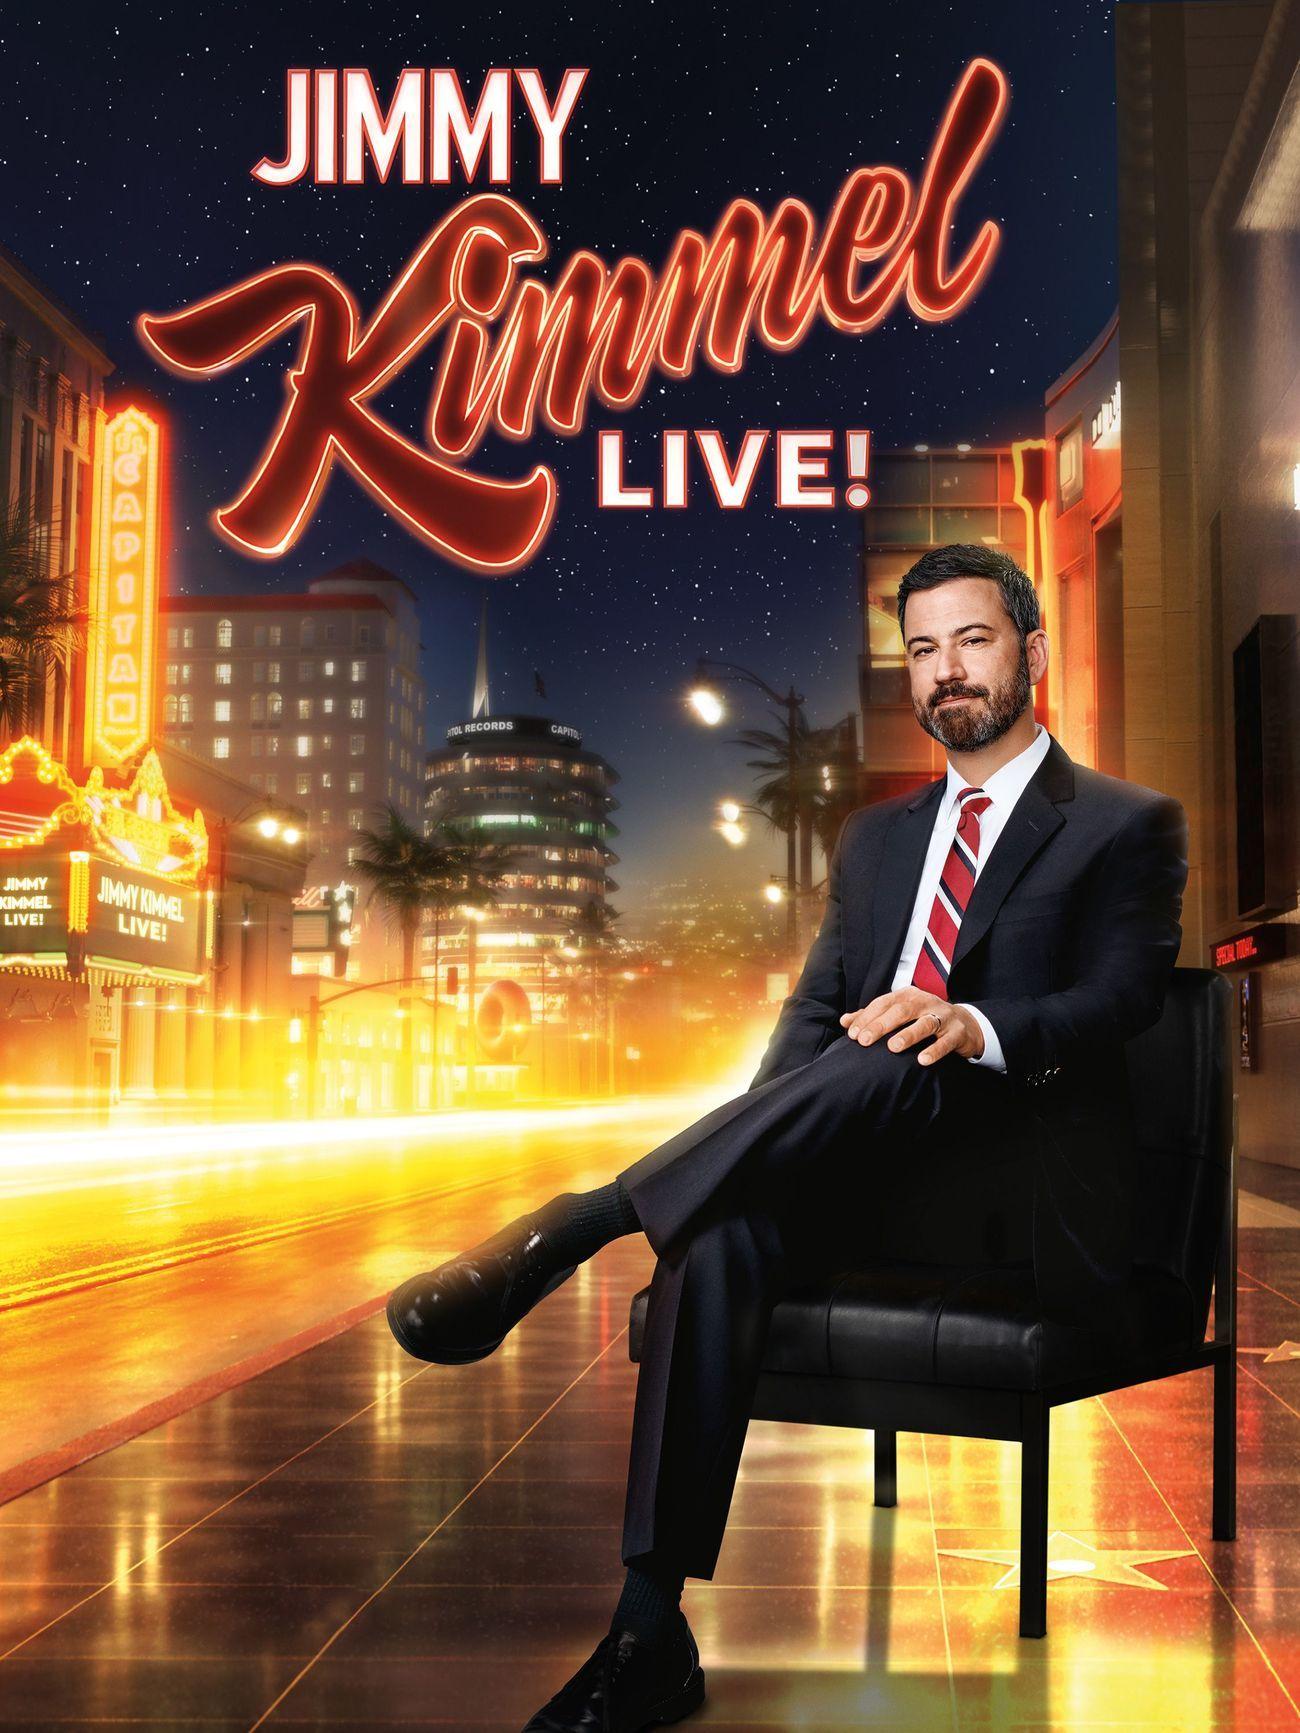 Jimmy Kimmel Live Vip Green Room